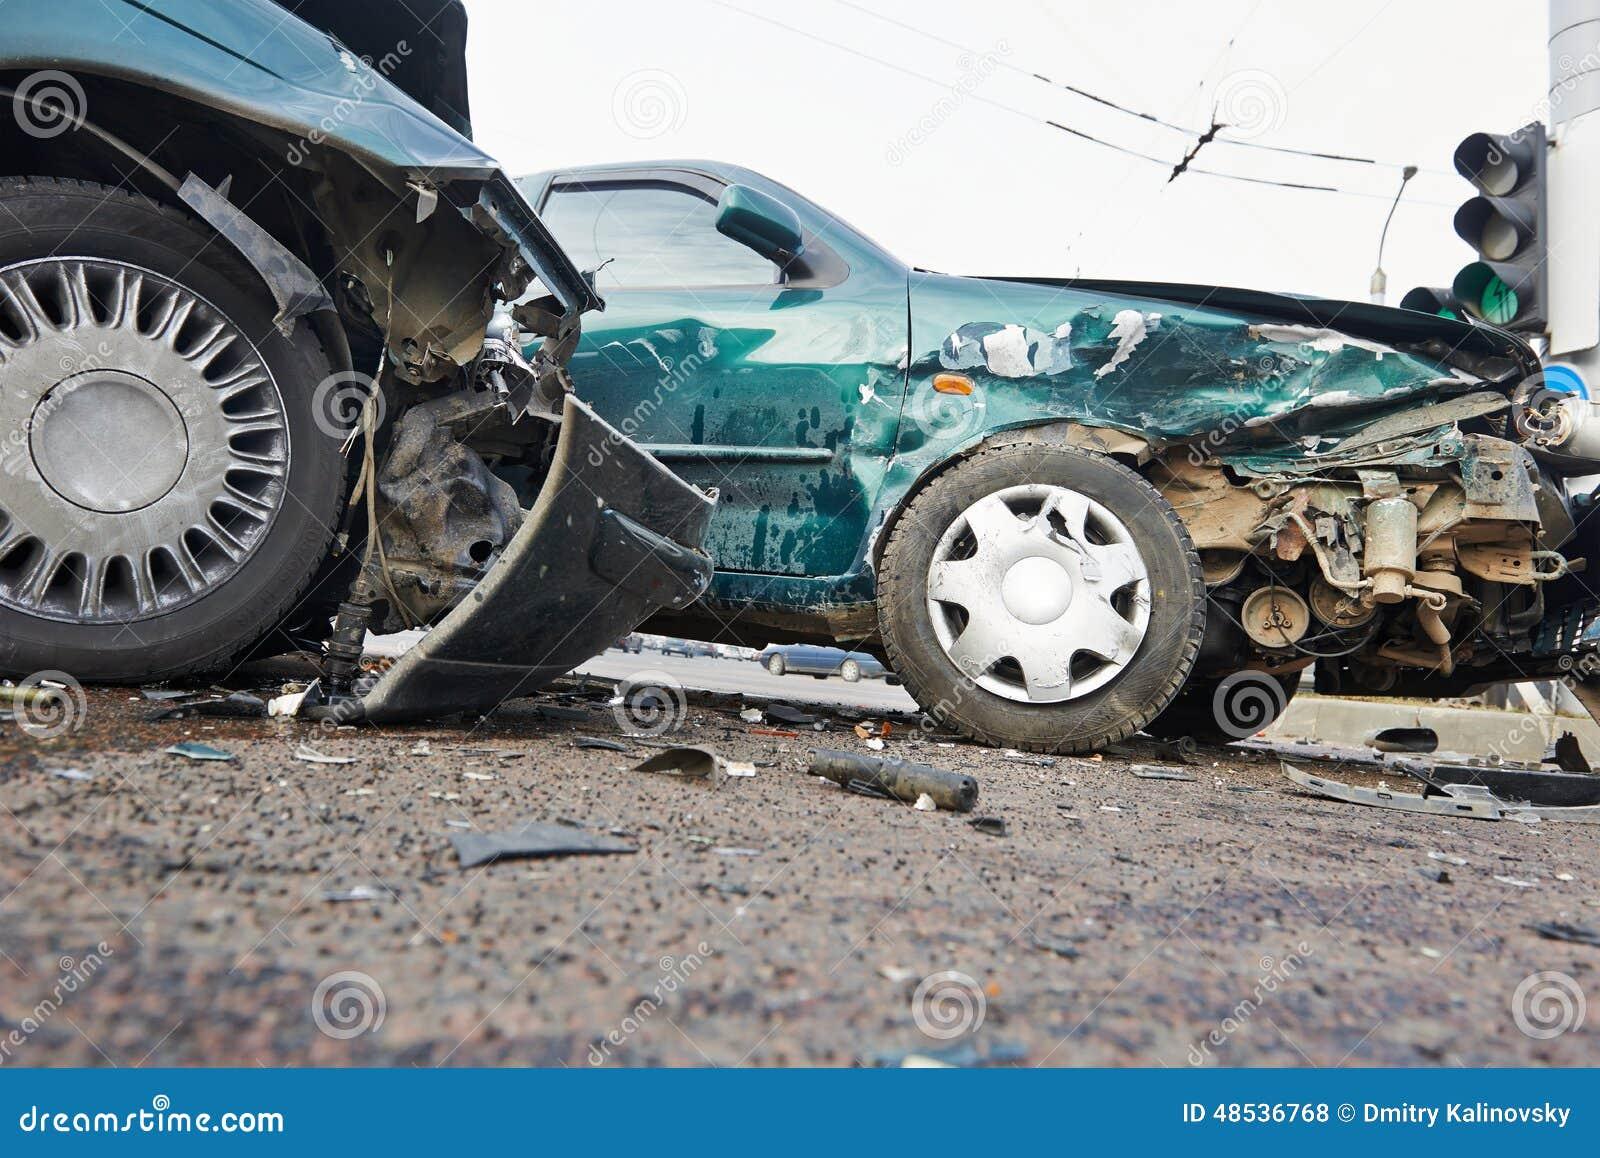 Automobile Crash Collision In Urban Street Stock Photo